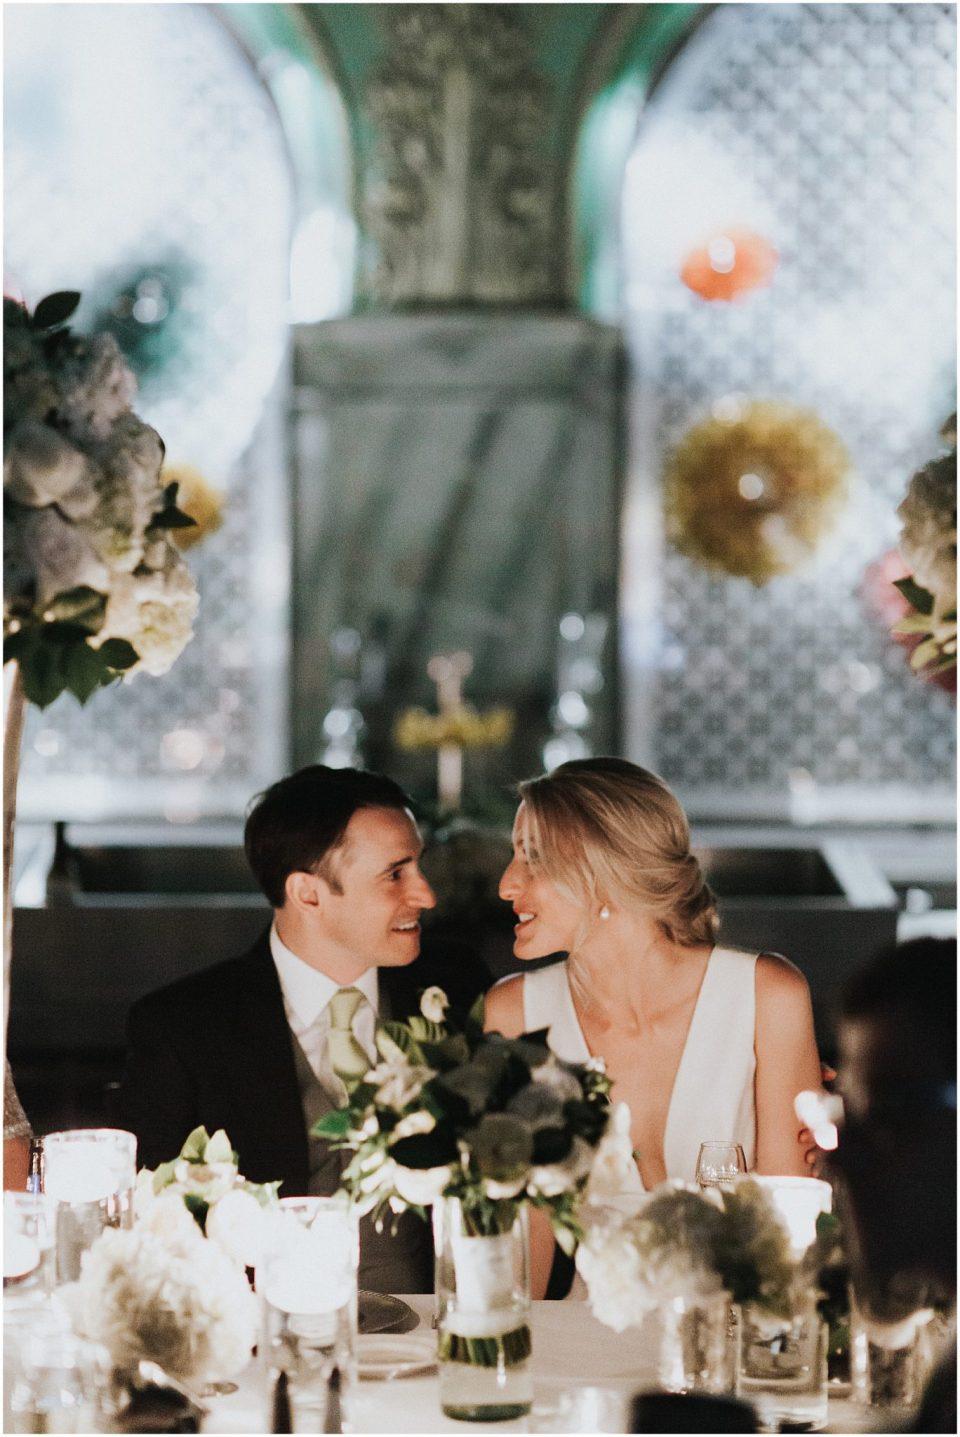 morgan-nacho-sullivan&sullivan-stlwedding (34 of 77)_seattle wedding.jpg